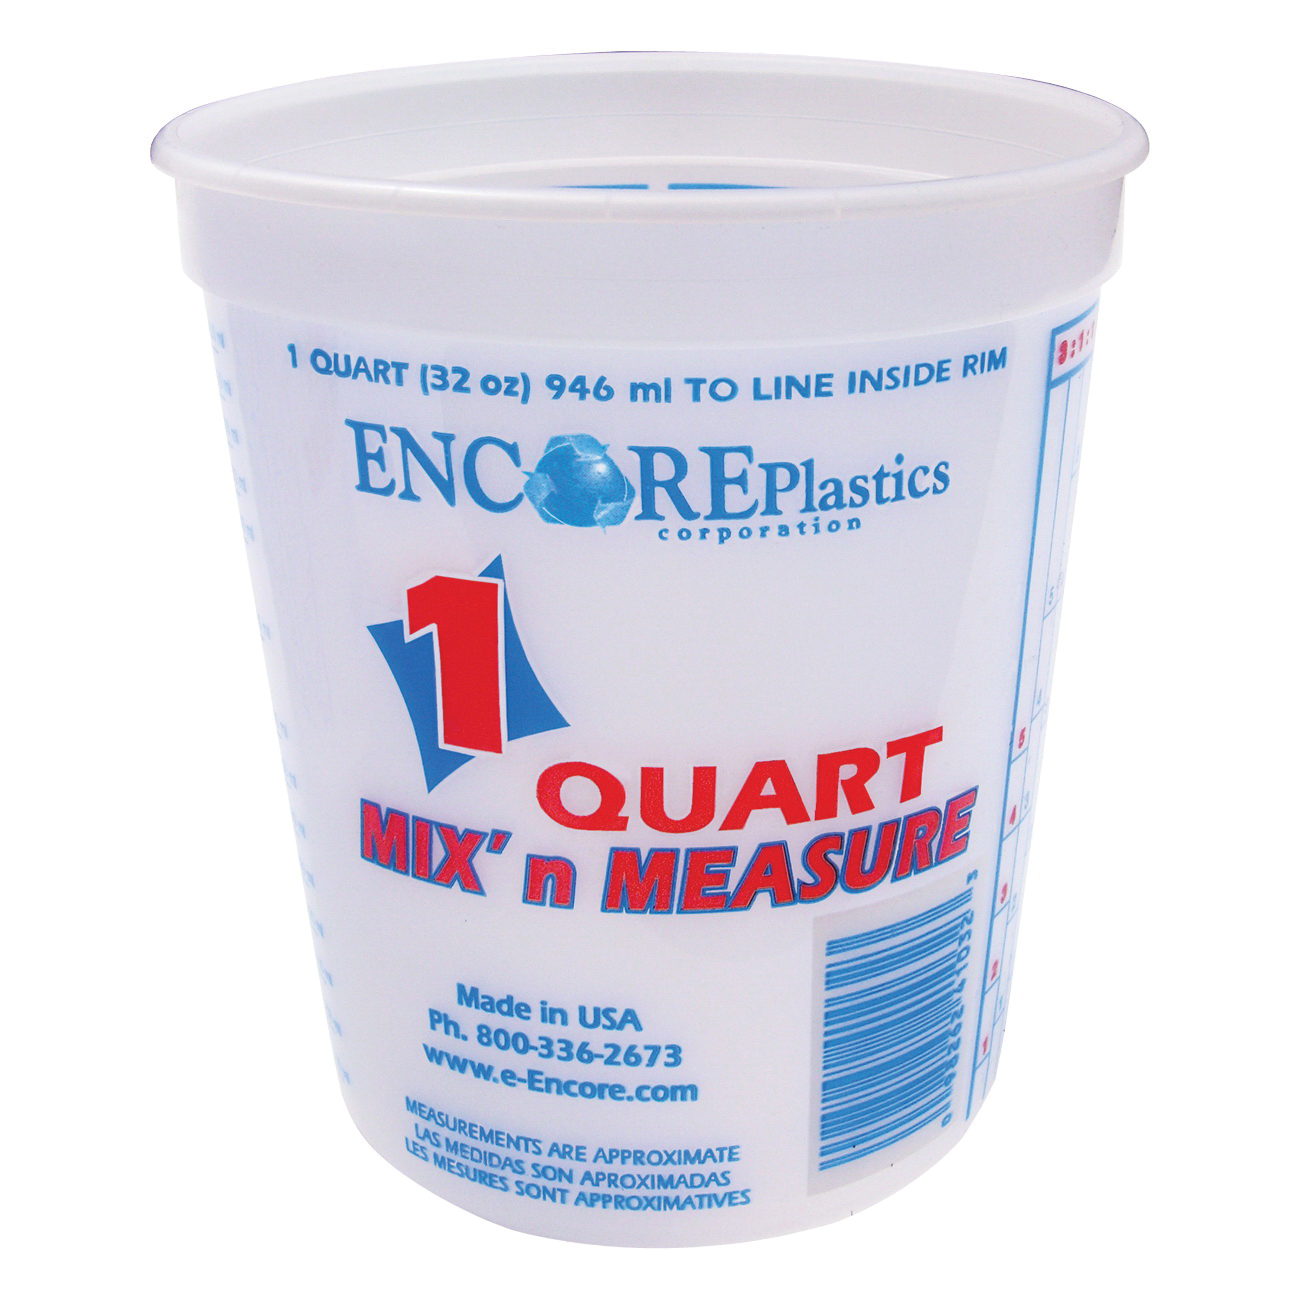 Picture of ENCORE Plastics 300343 Paint Container, 1 qt Capacity, Plastic